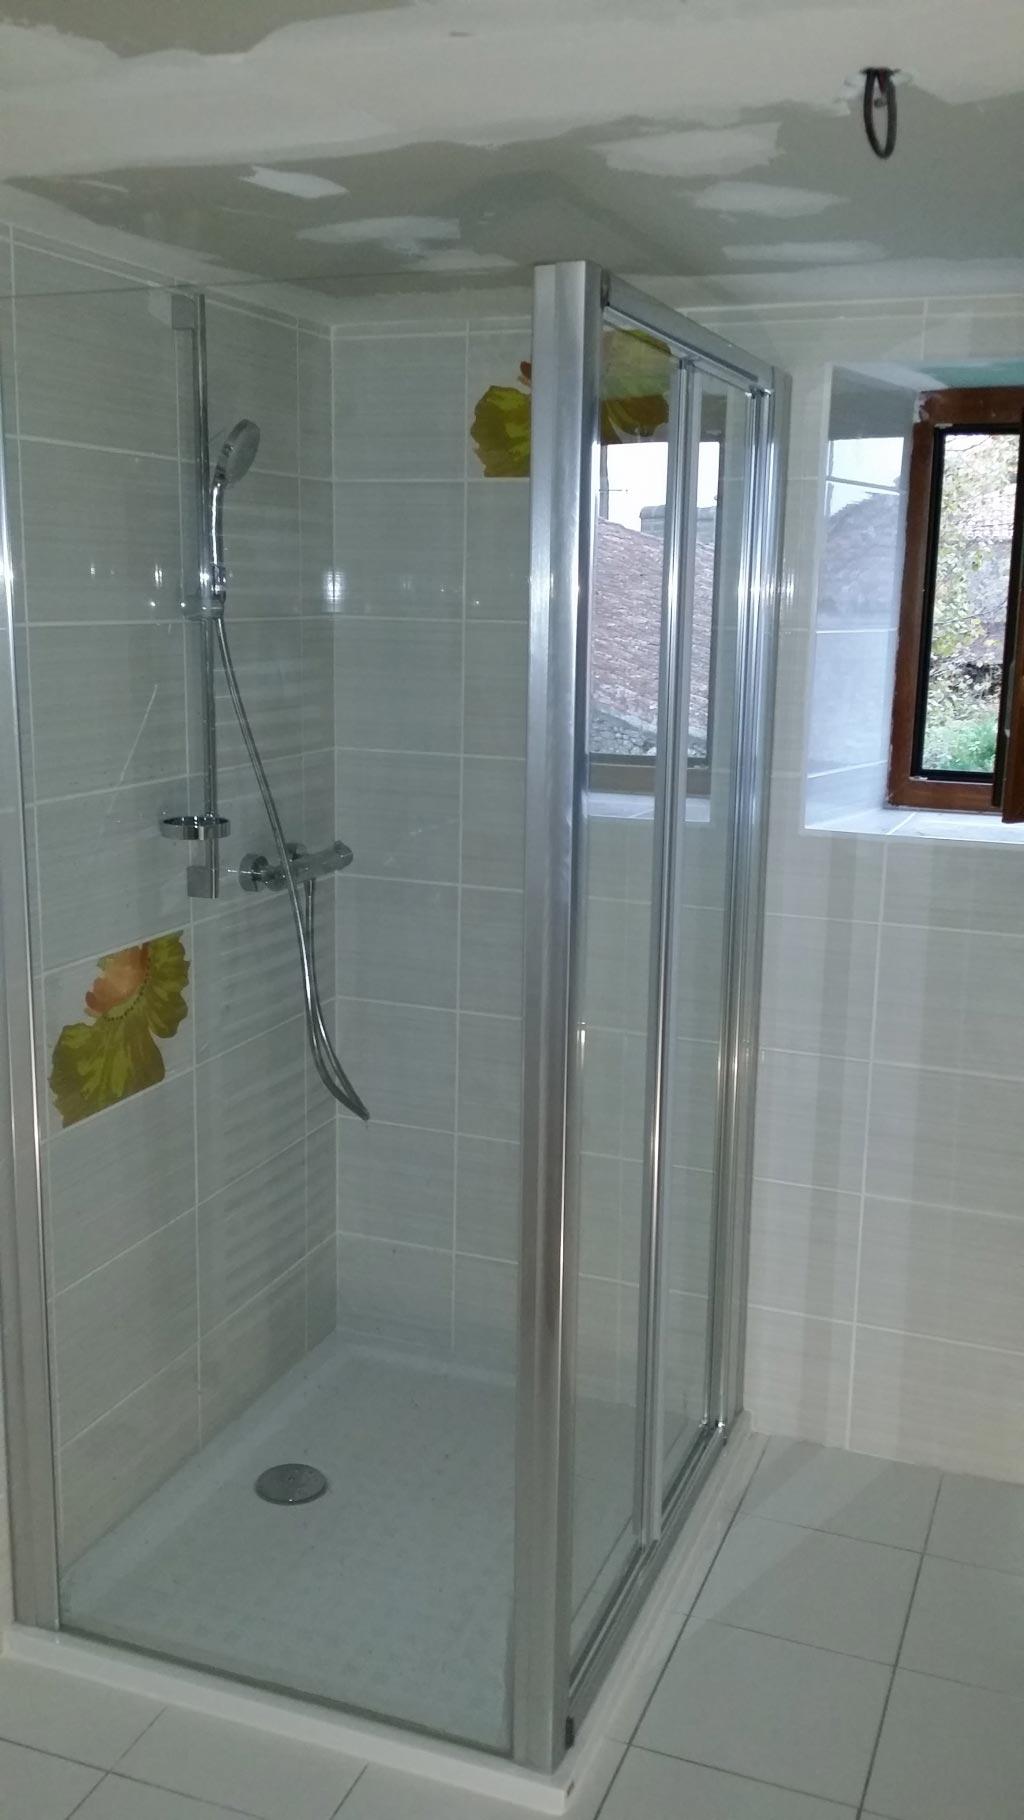 Salle de bain rénovée à Naujean et Postiac 33 Gironde